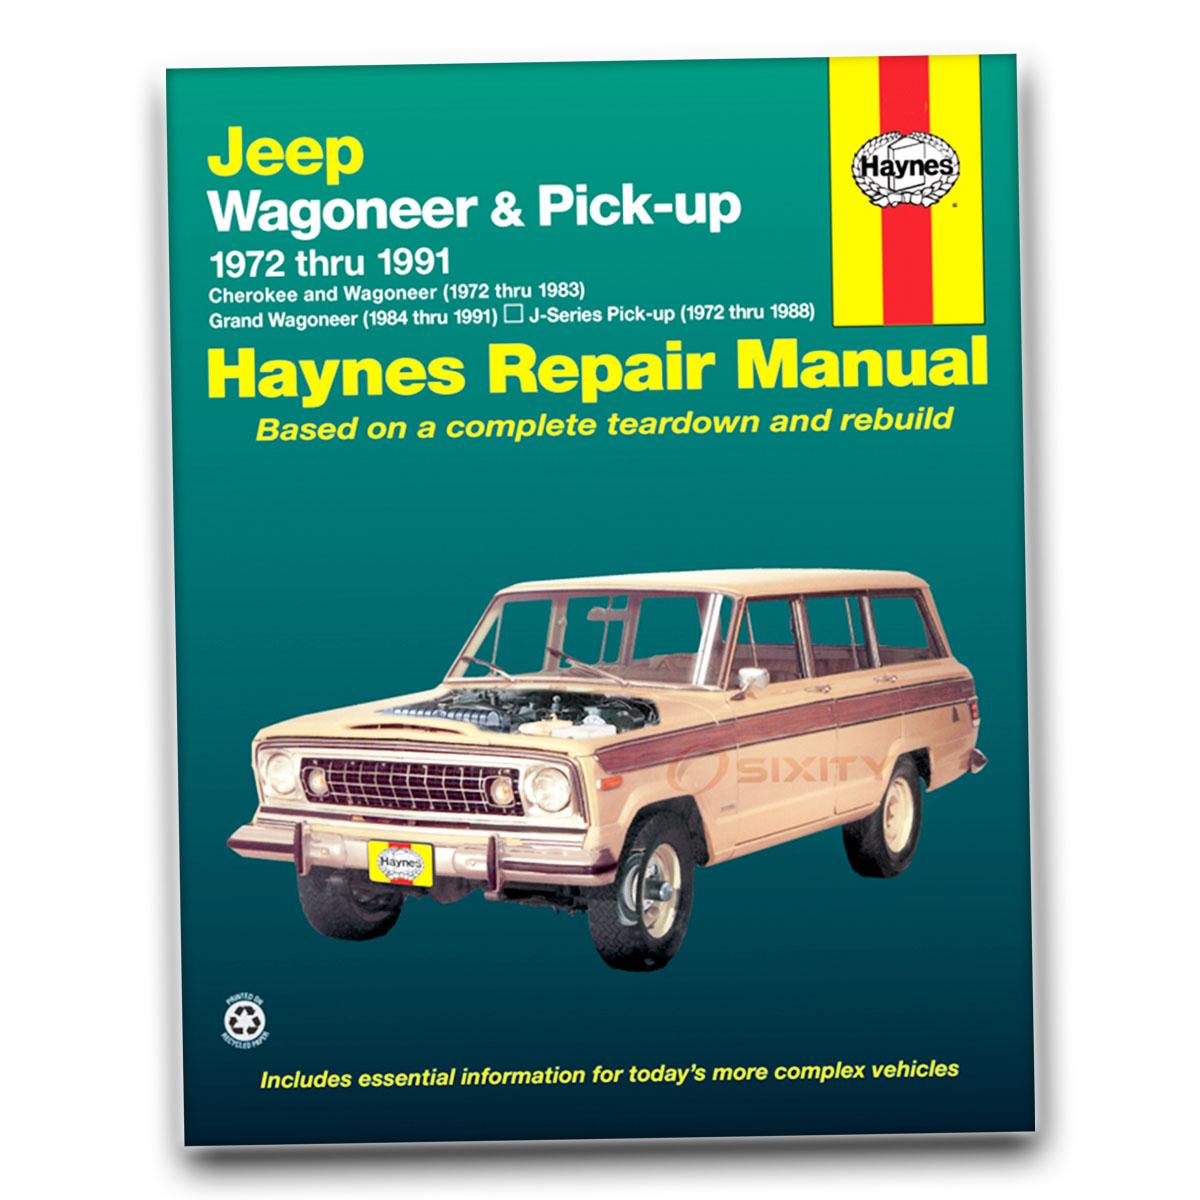 jeep j10 haynes repair manual base shop service garage book wt ebay rh ebay com 2011 Jeep Patriot Repair Manual Jeep Repair Manual Online